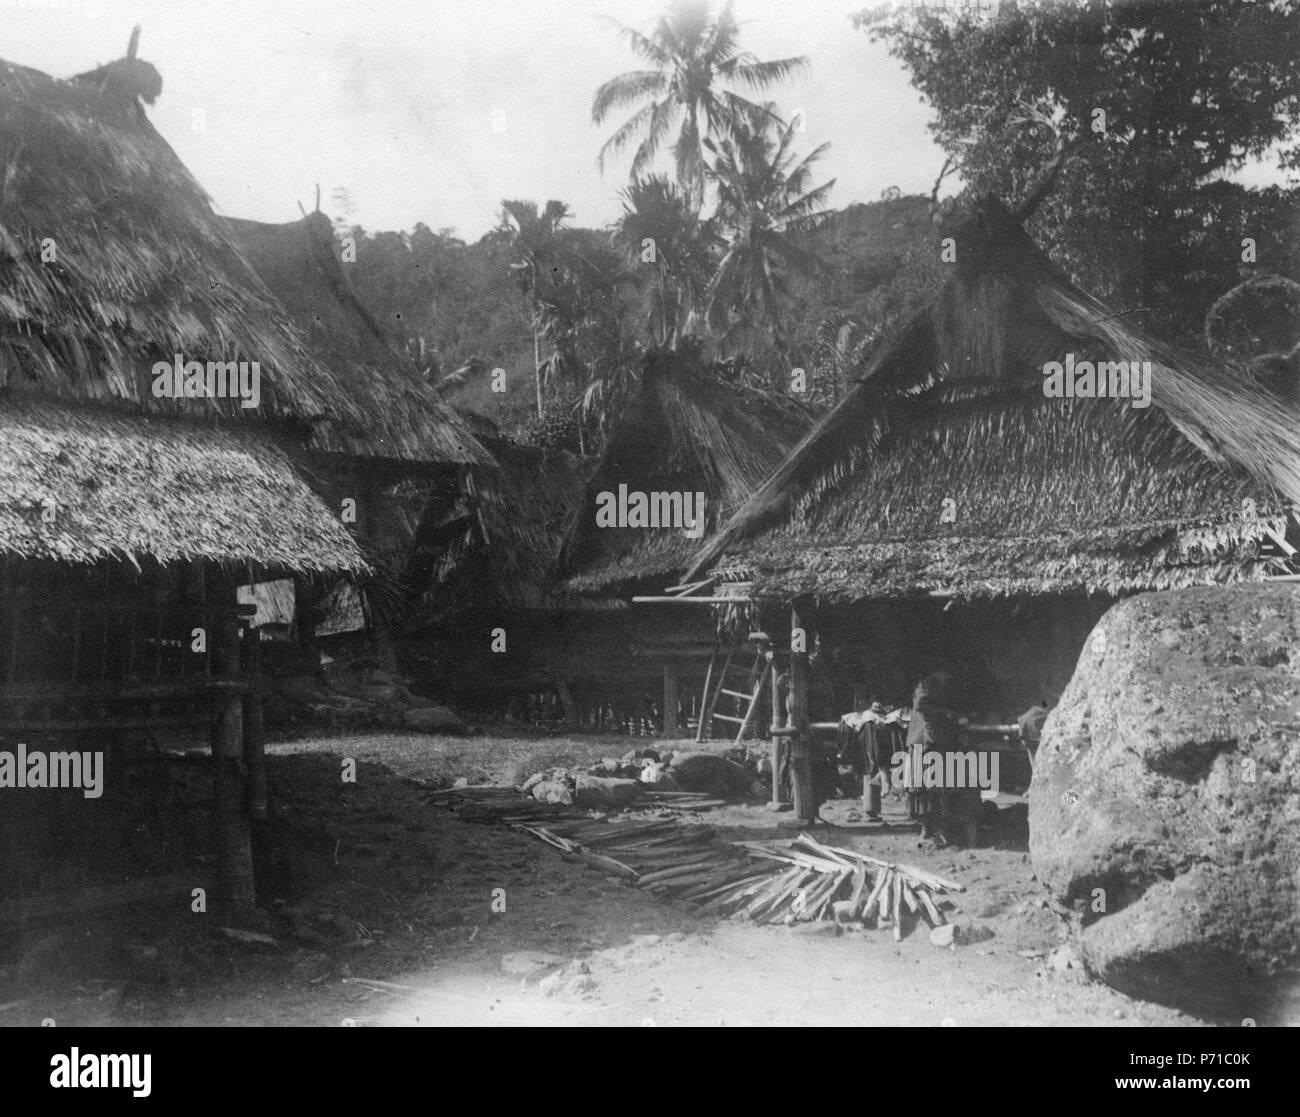 7 Byn Mataoee, en mycket gammal by. Mataoee. Indonesien - SMVK - 000274 - Stock Image